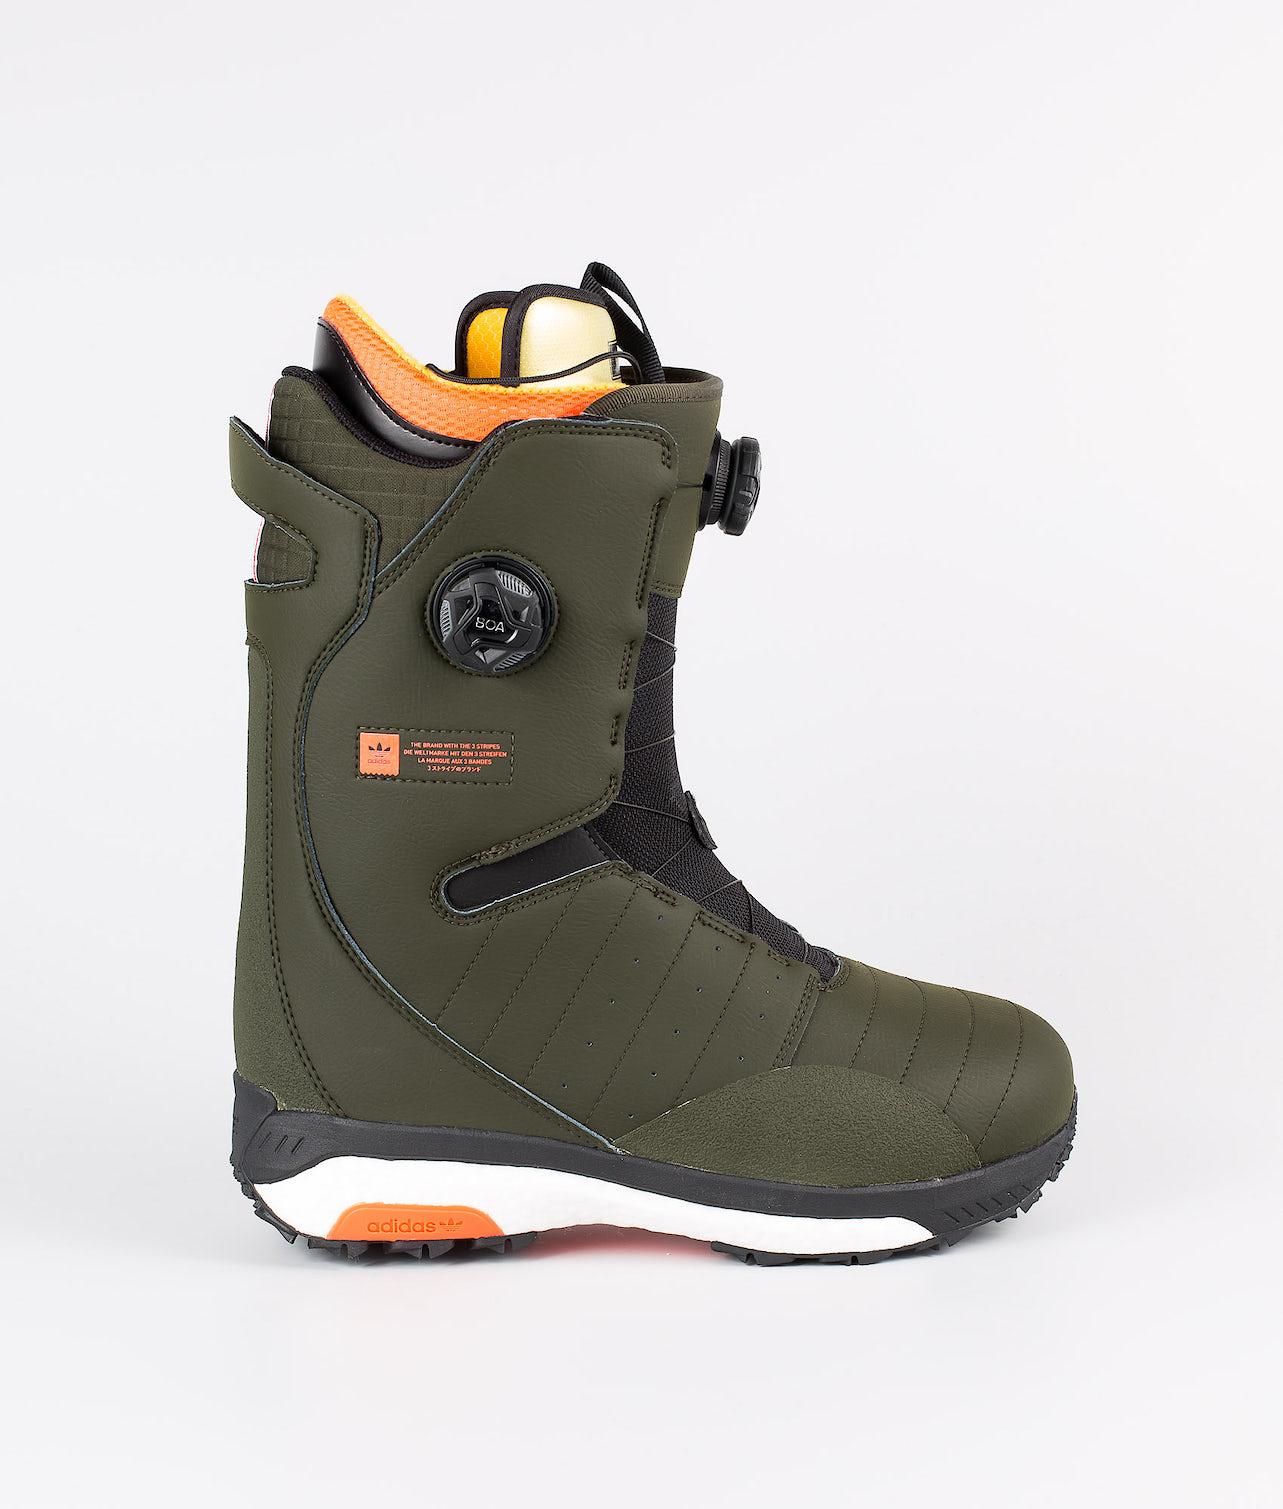 Adidas Snowboarding Acerra 3st Adv Boots Night Cargo/Core Black/Solar Red